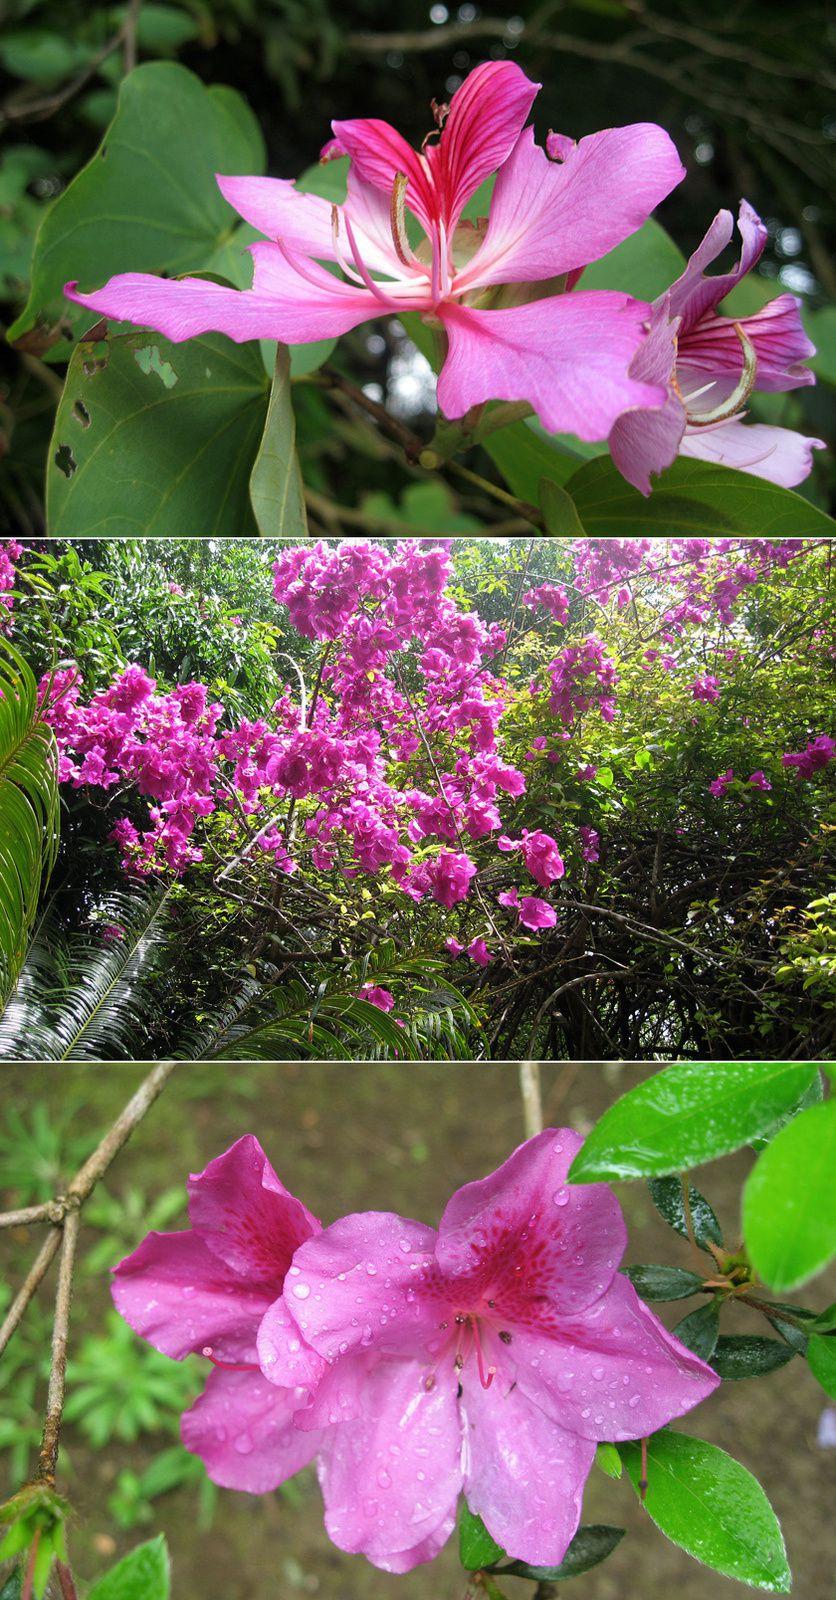 Fleurs - flamboyant, bougainvillier, hibiscus